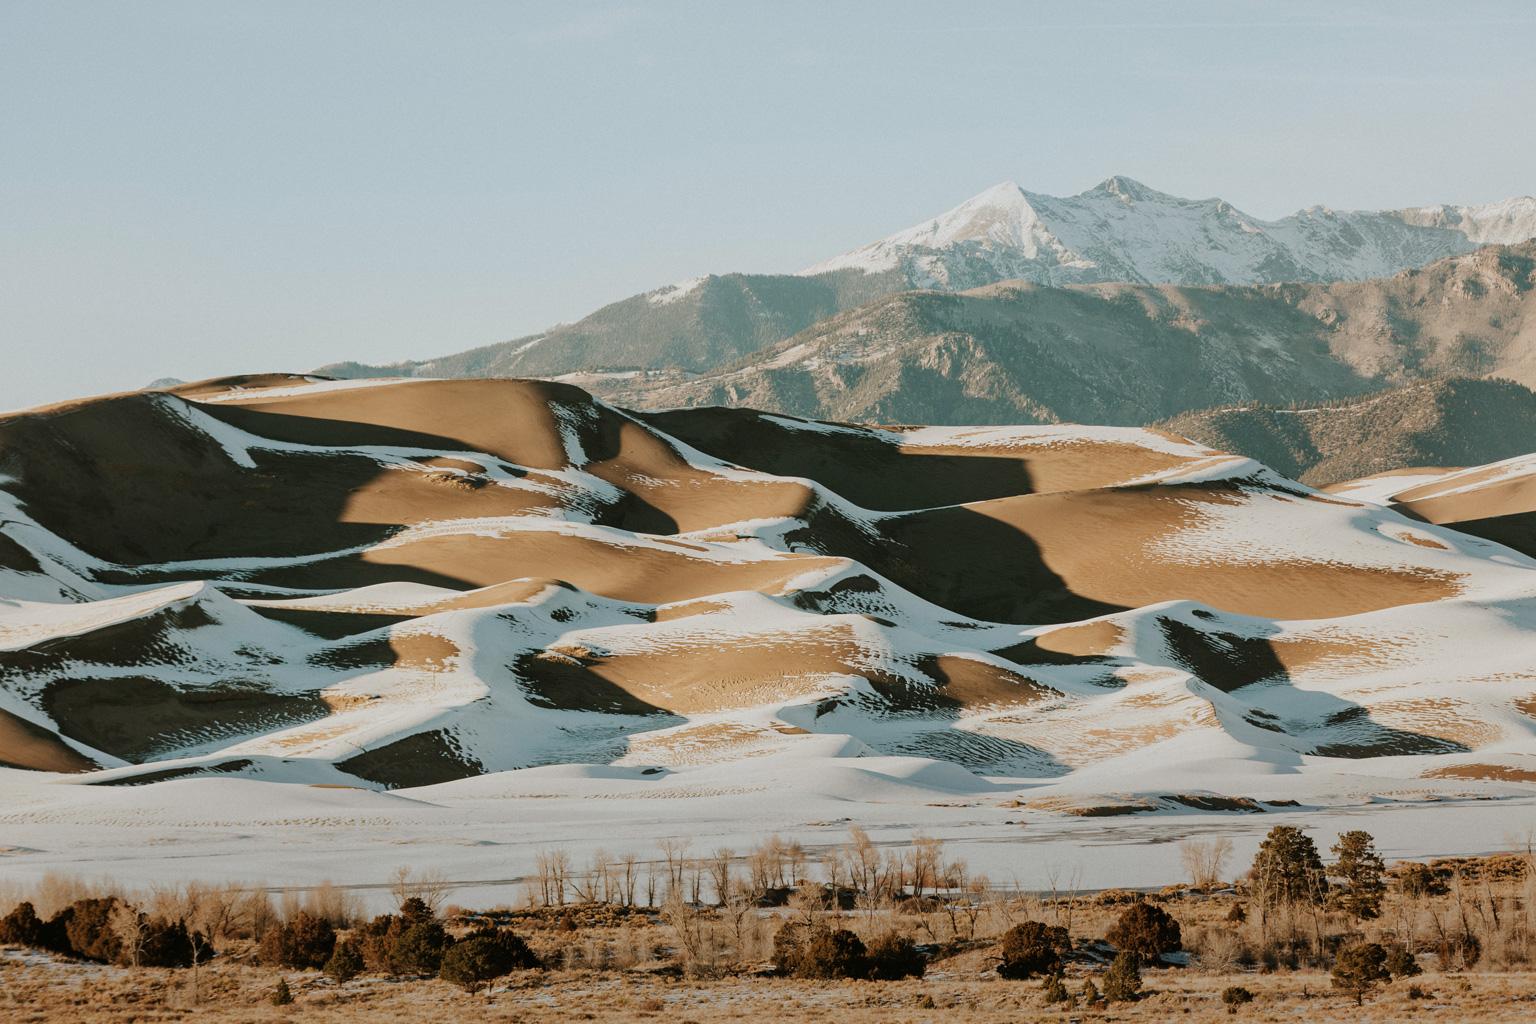 CindyGiovagnoli_Great_Sand_Dunes_National_Park_NPS_Colorado_roadtrip-008.jpg